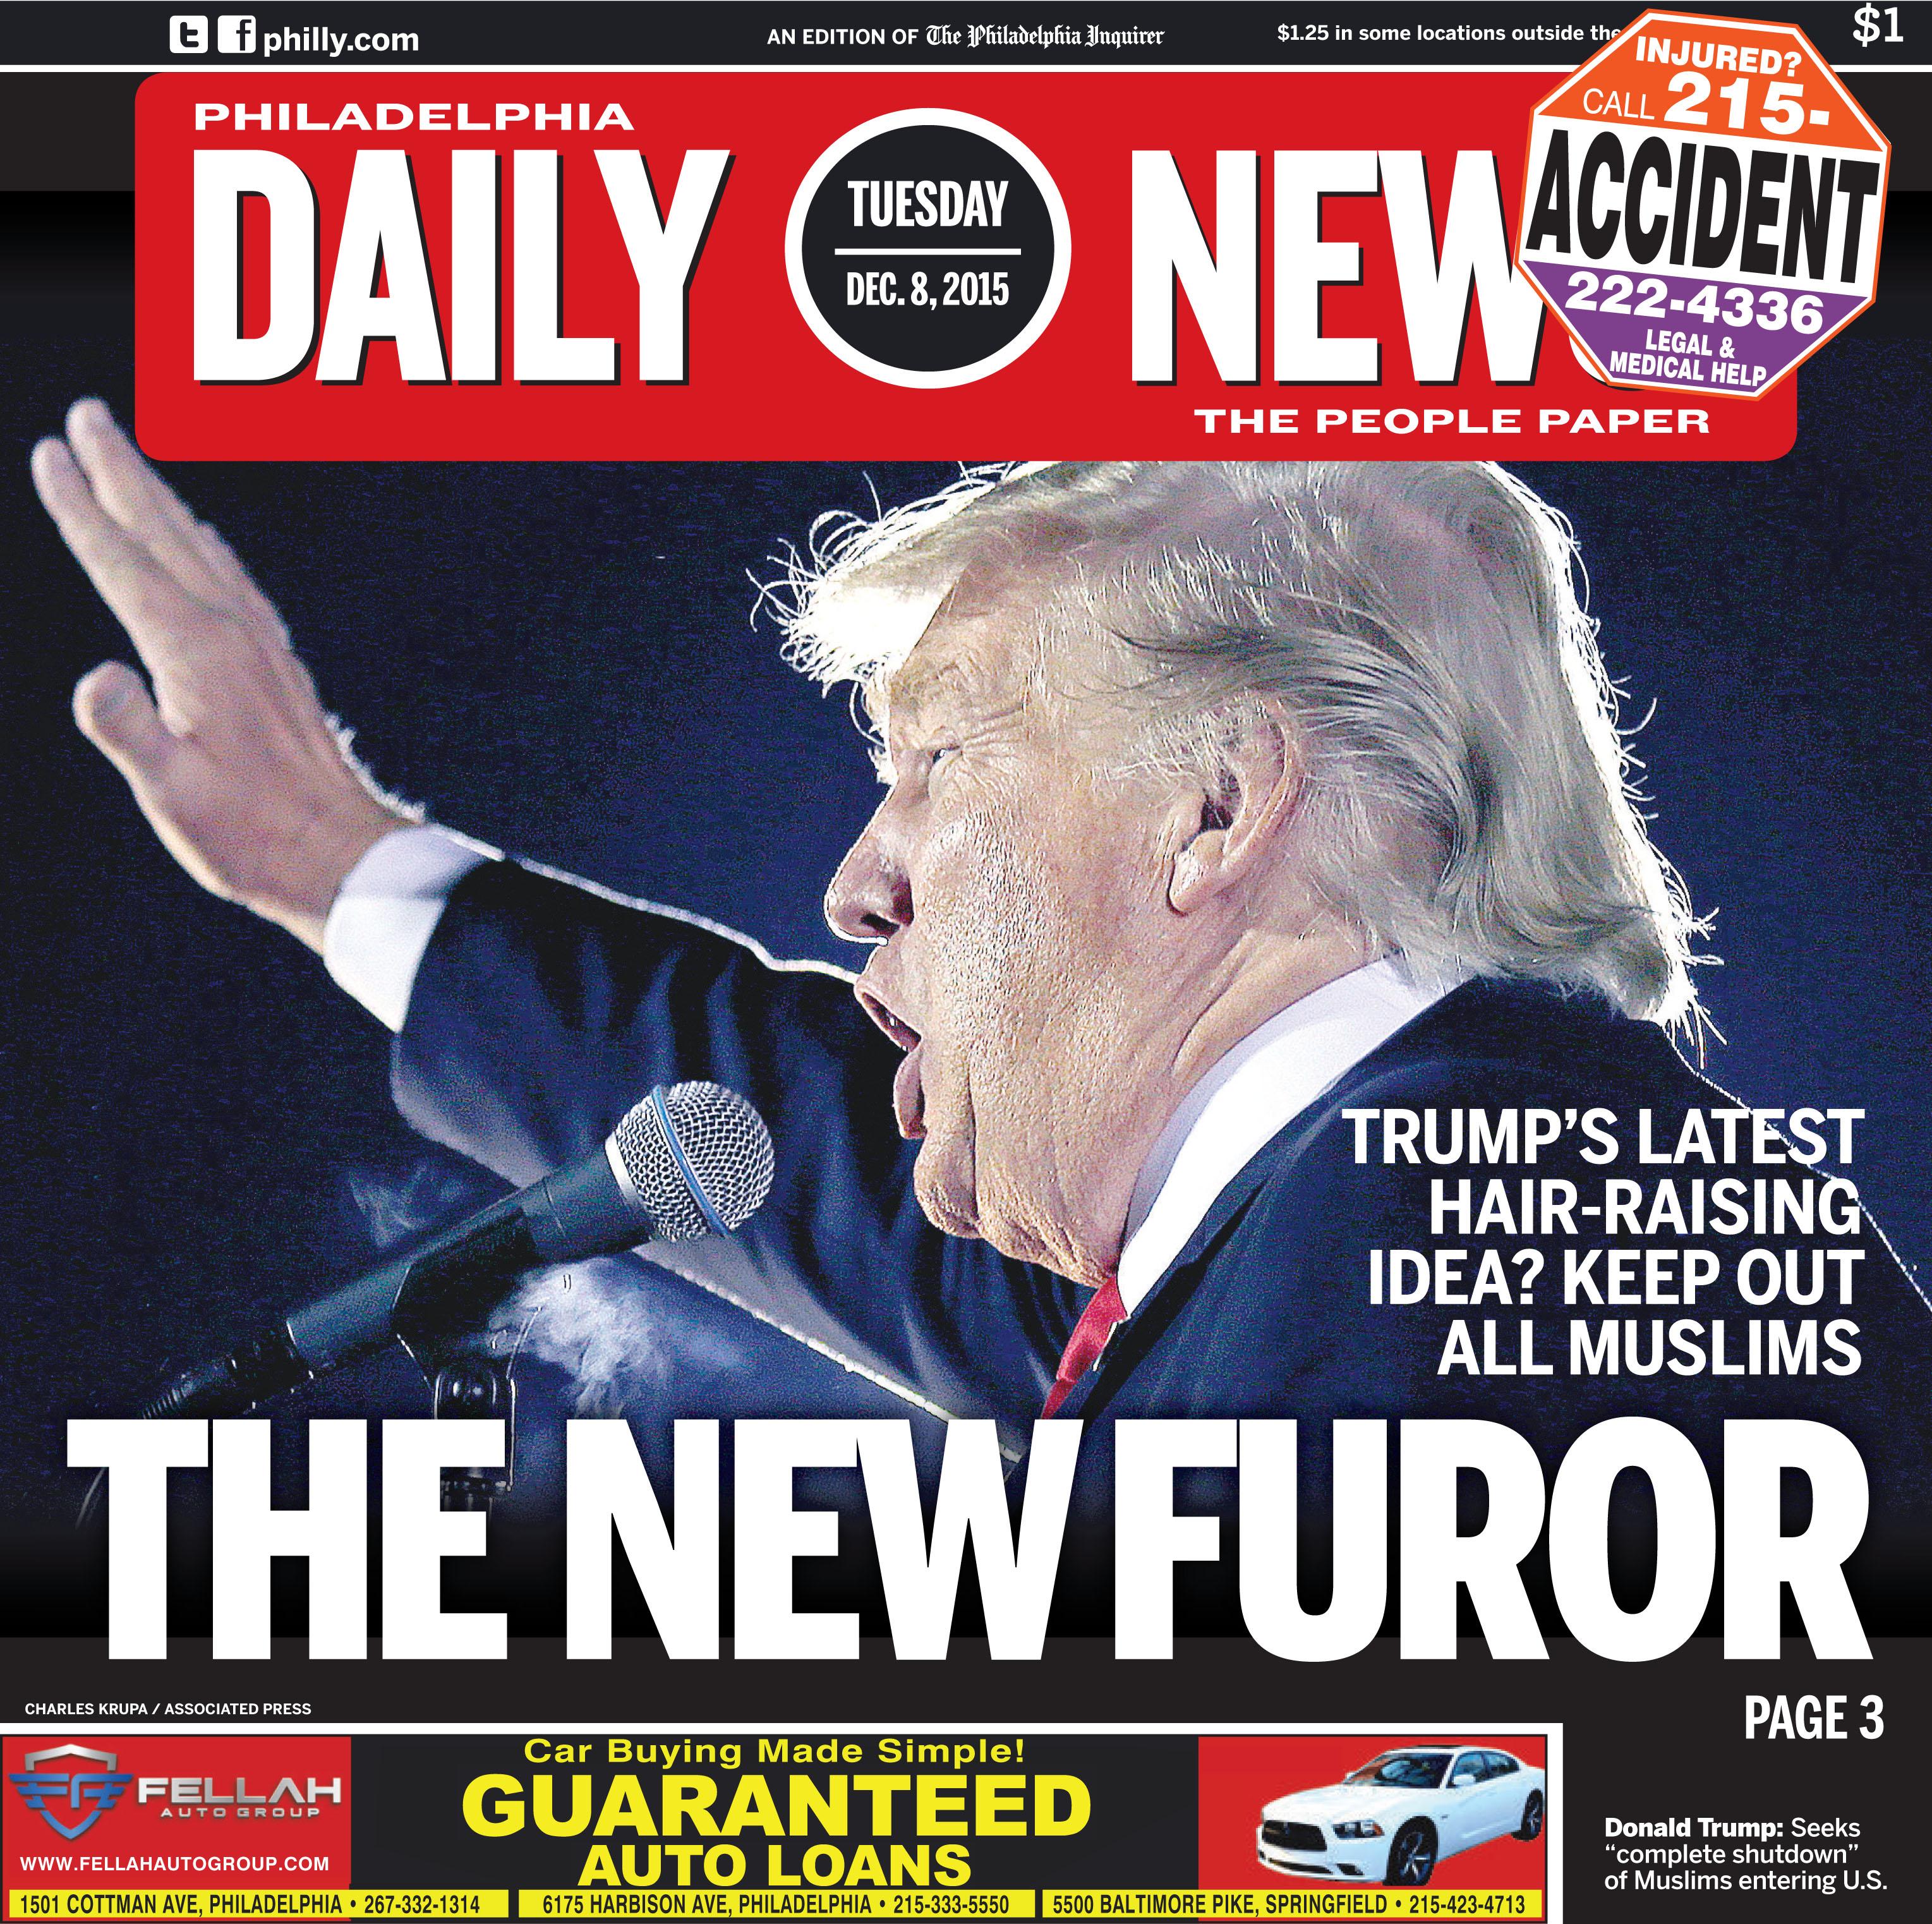 """The Furor"" cover of Philadelphia Daily News"